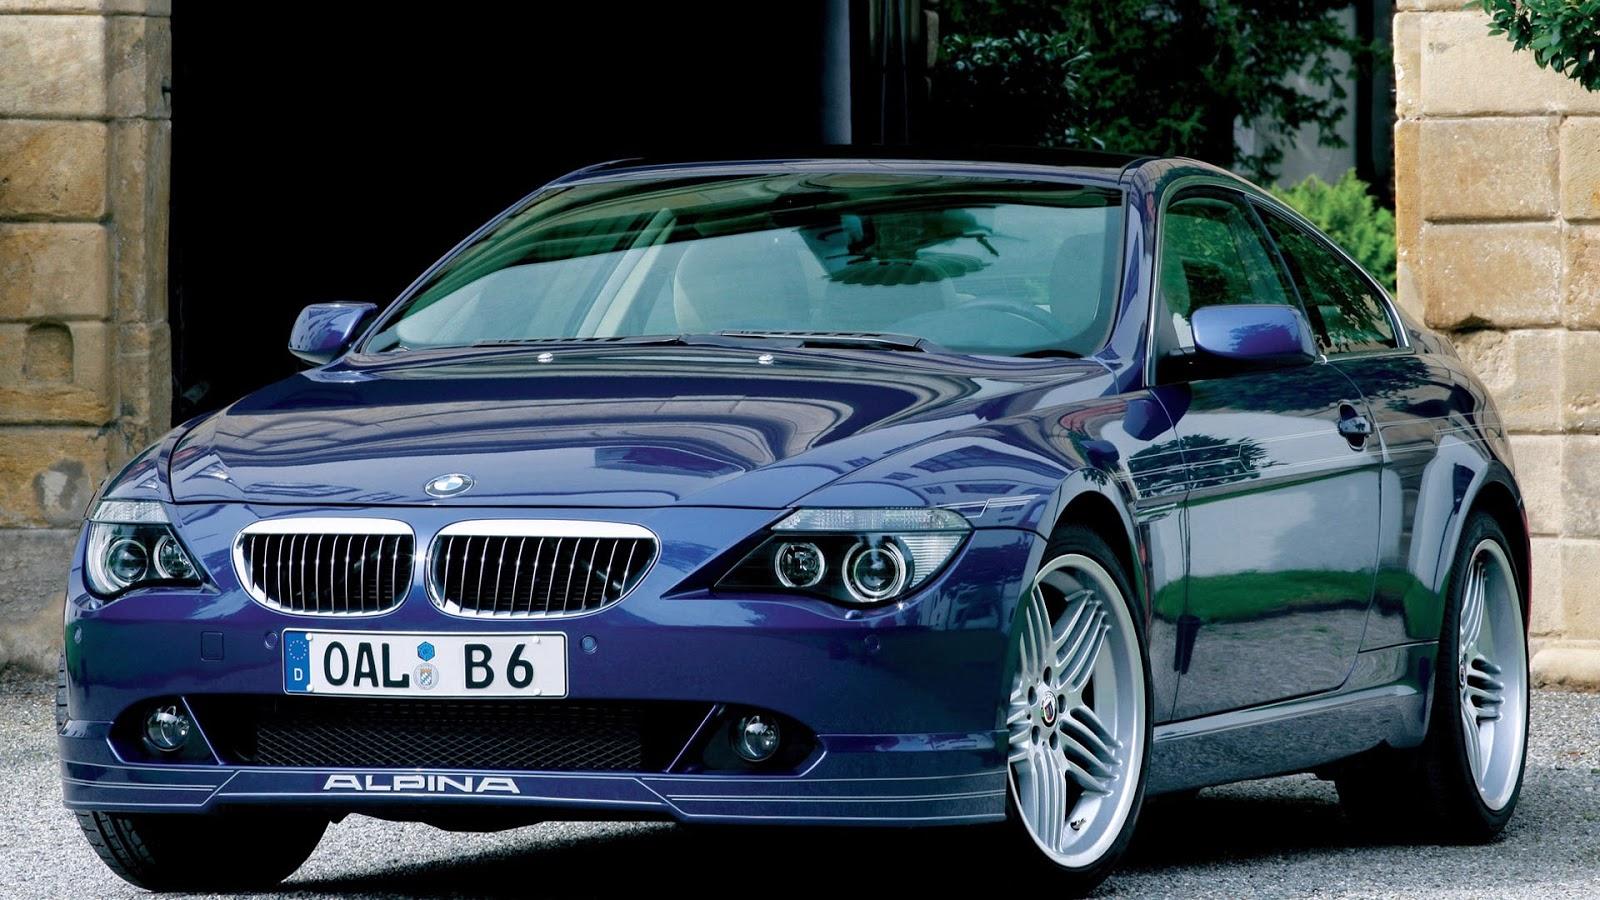 BMW Alpina B6 >> Daily Amazing Fun: Amazing Cars Wallpapers